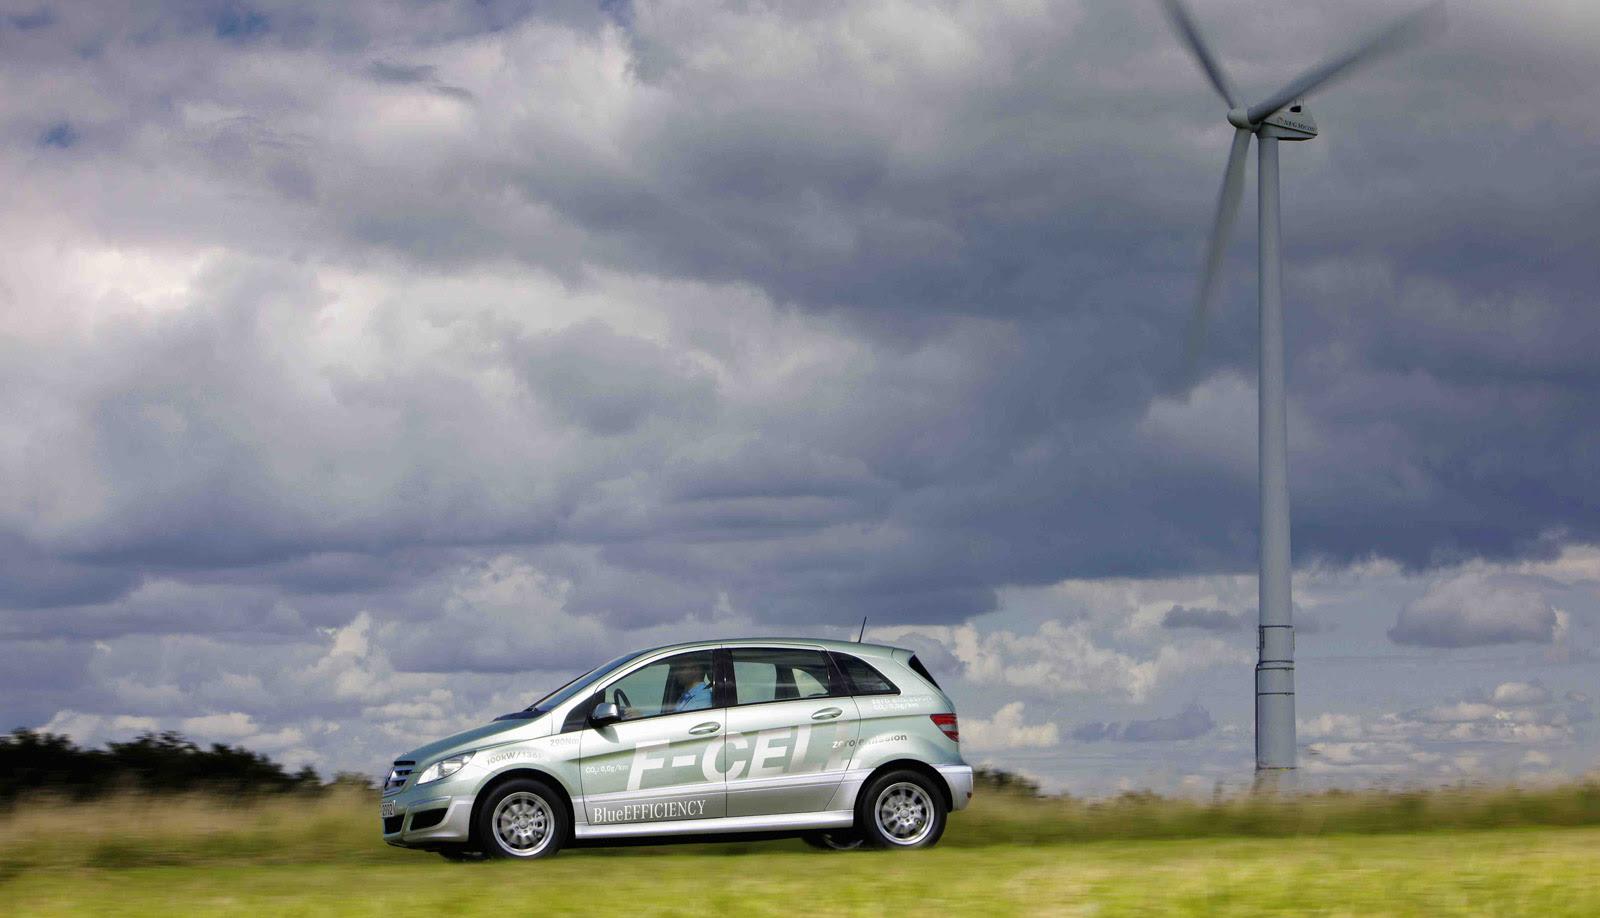 2019 Mini Hardtop 4 Door Spy Shots Motor Authority | 2018, 2019, 2020 Ford Cars